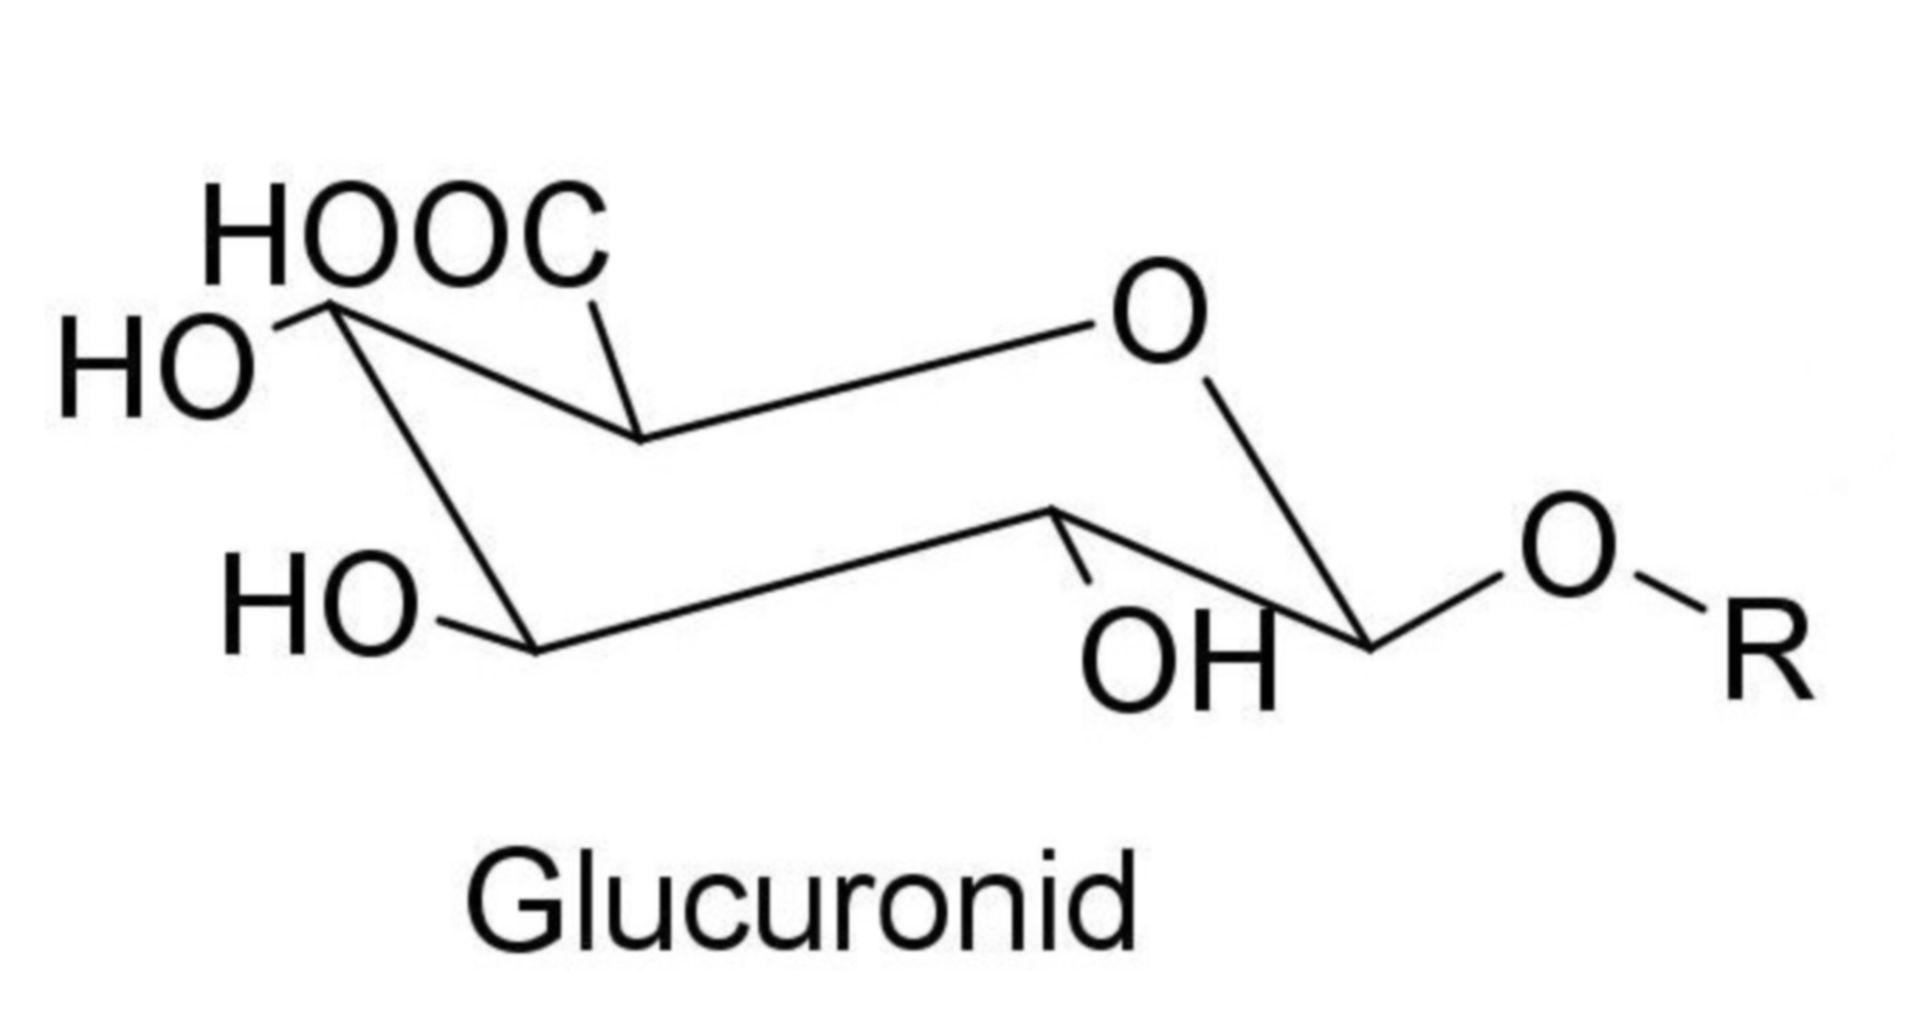 Glucuronid